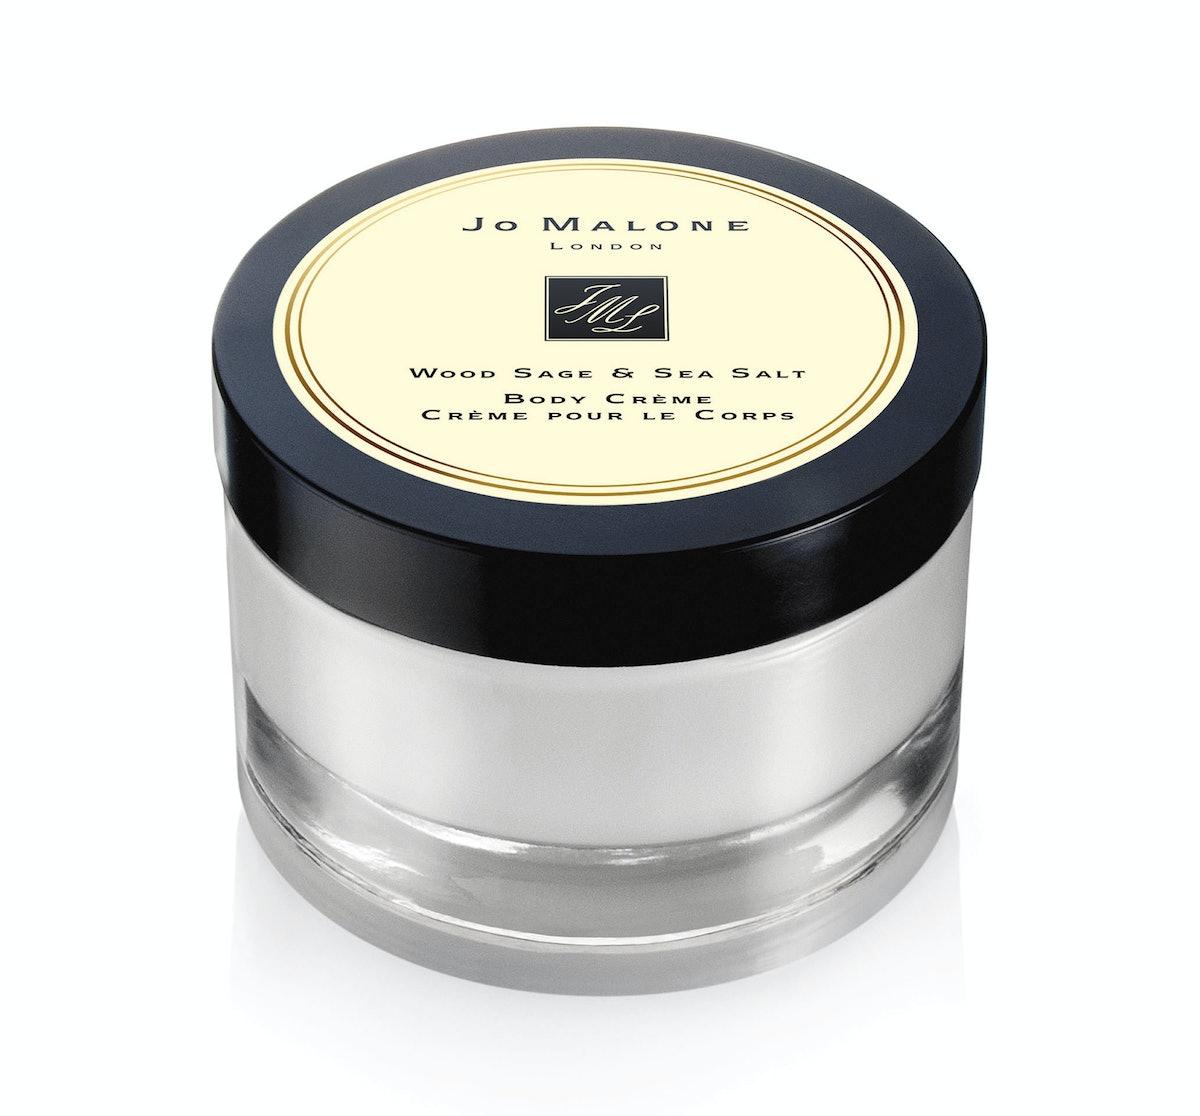 Jo Malone Sea Salt and Sage Body Crème